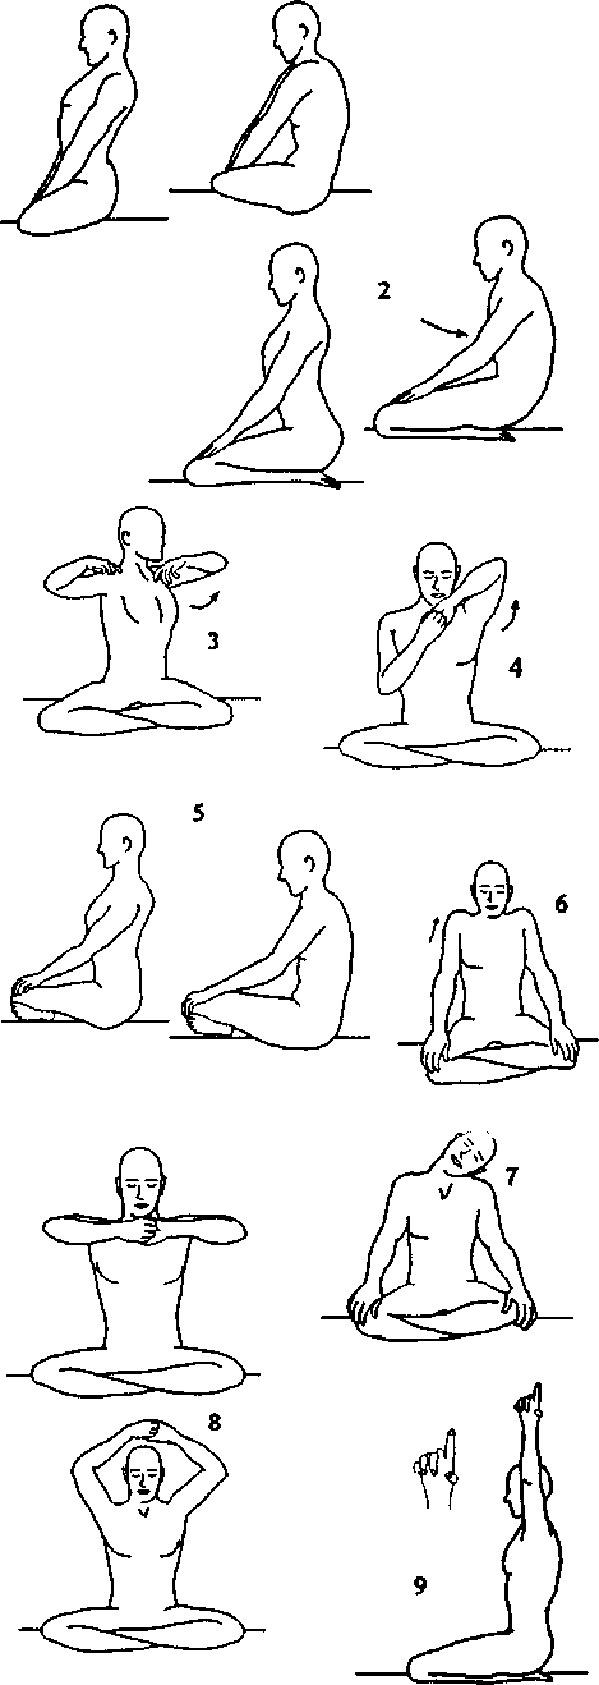 кундалини йога крийя